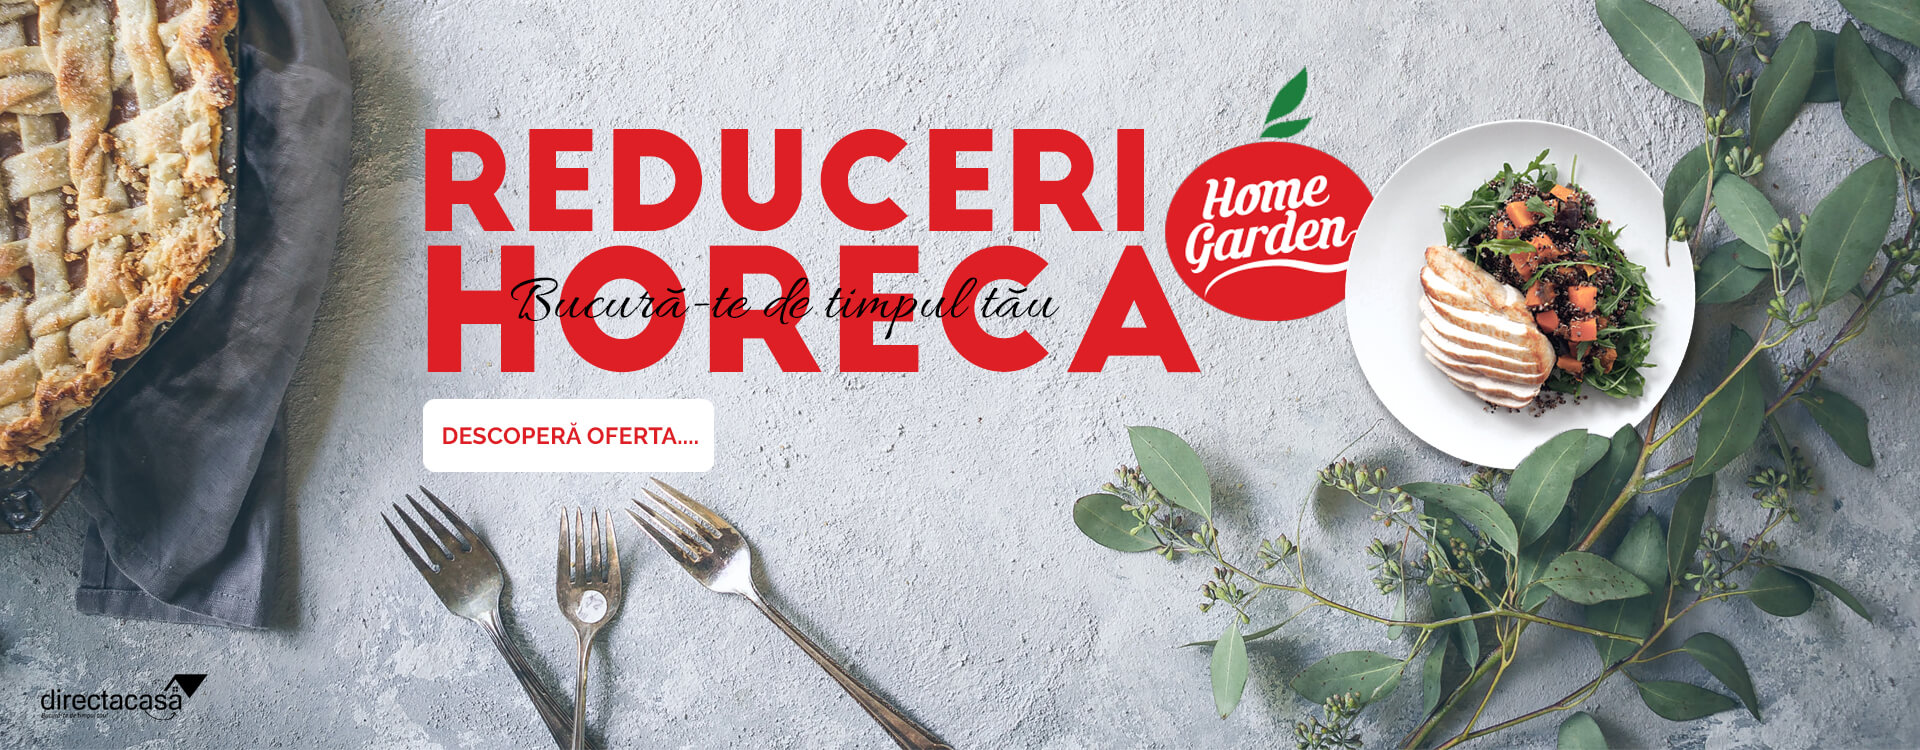 Reduceri Horeca Home Garden